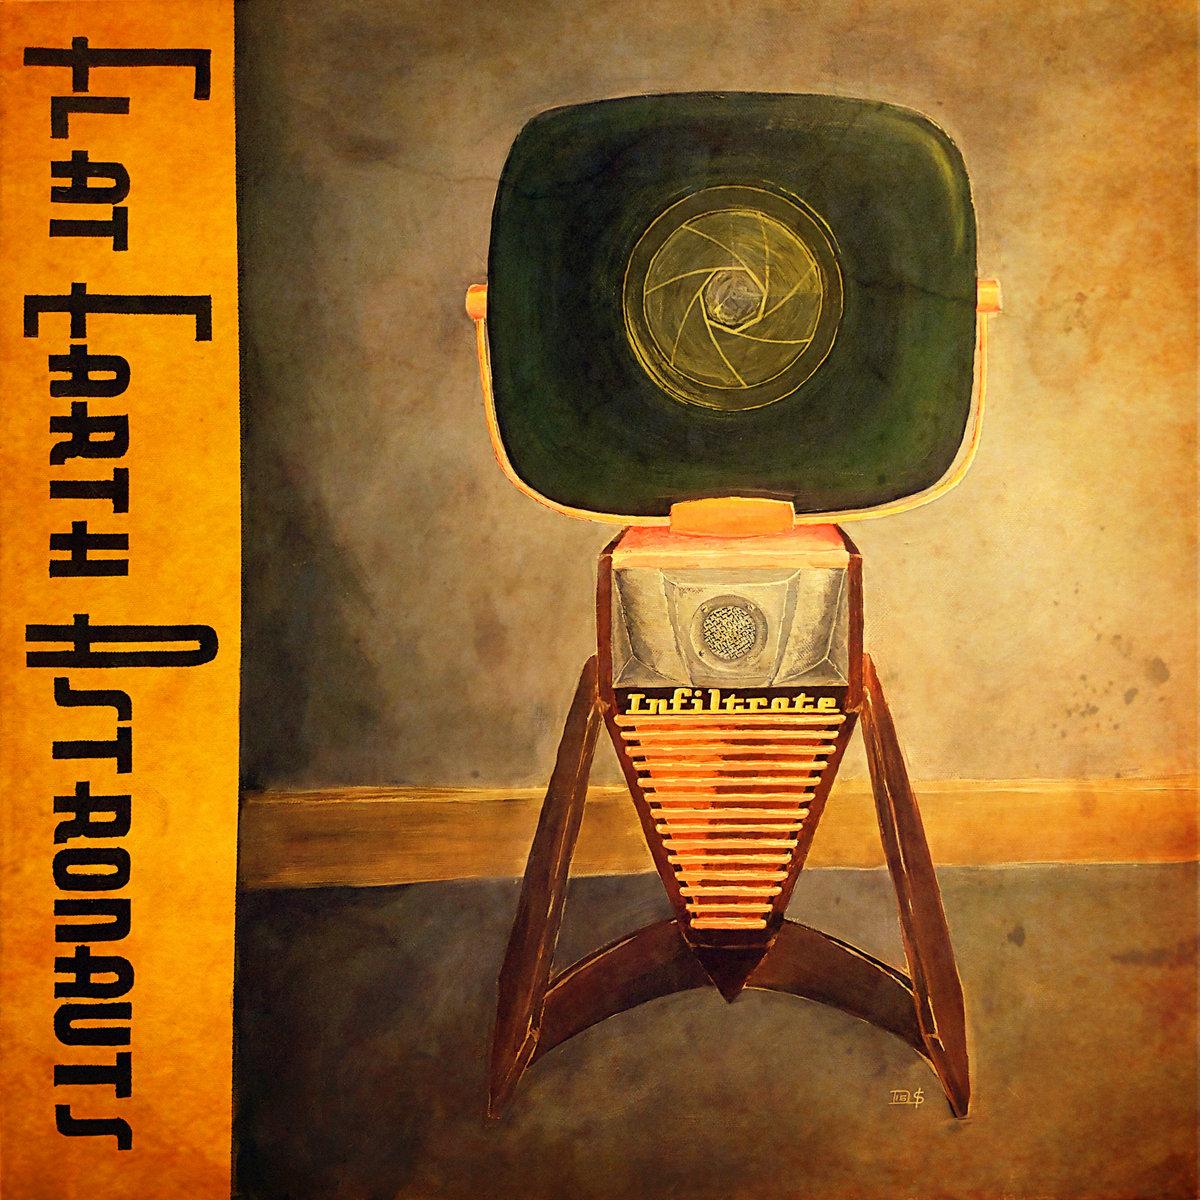 Faraday Cage | Flat Earth Astronauts